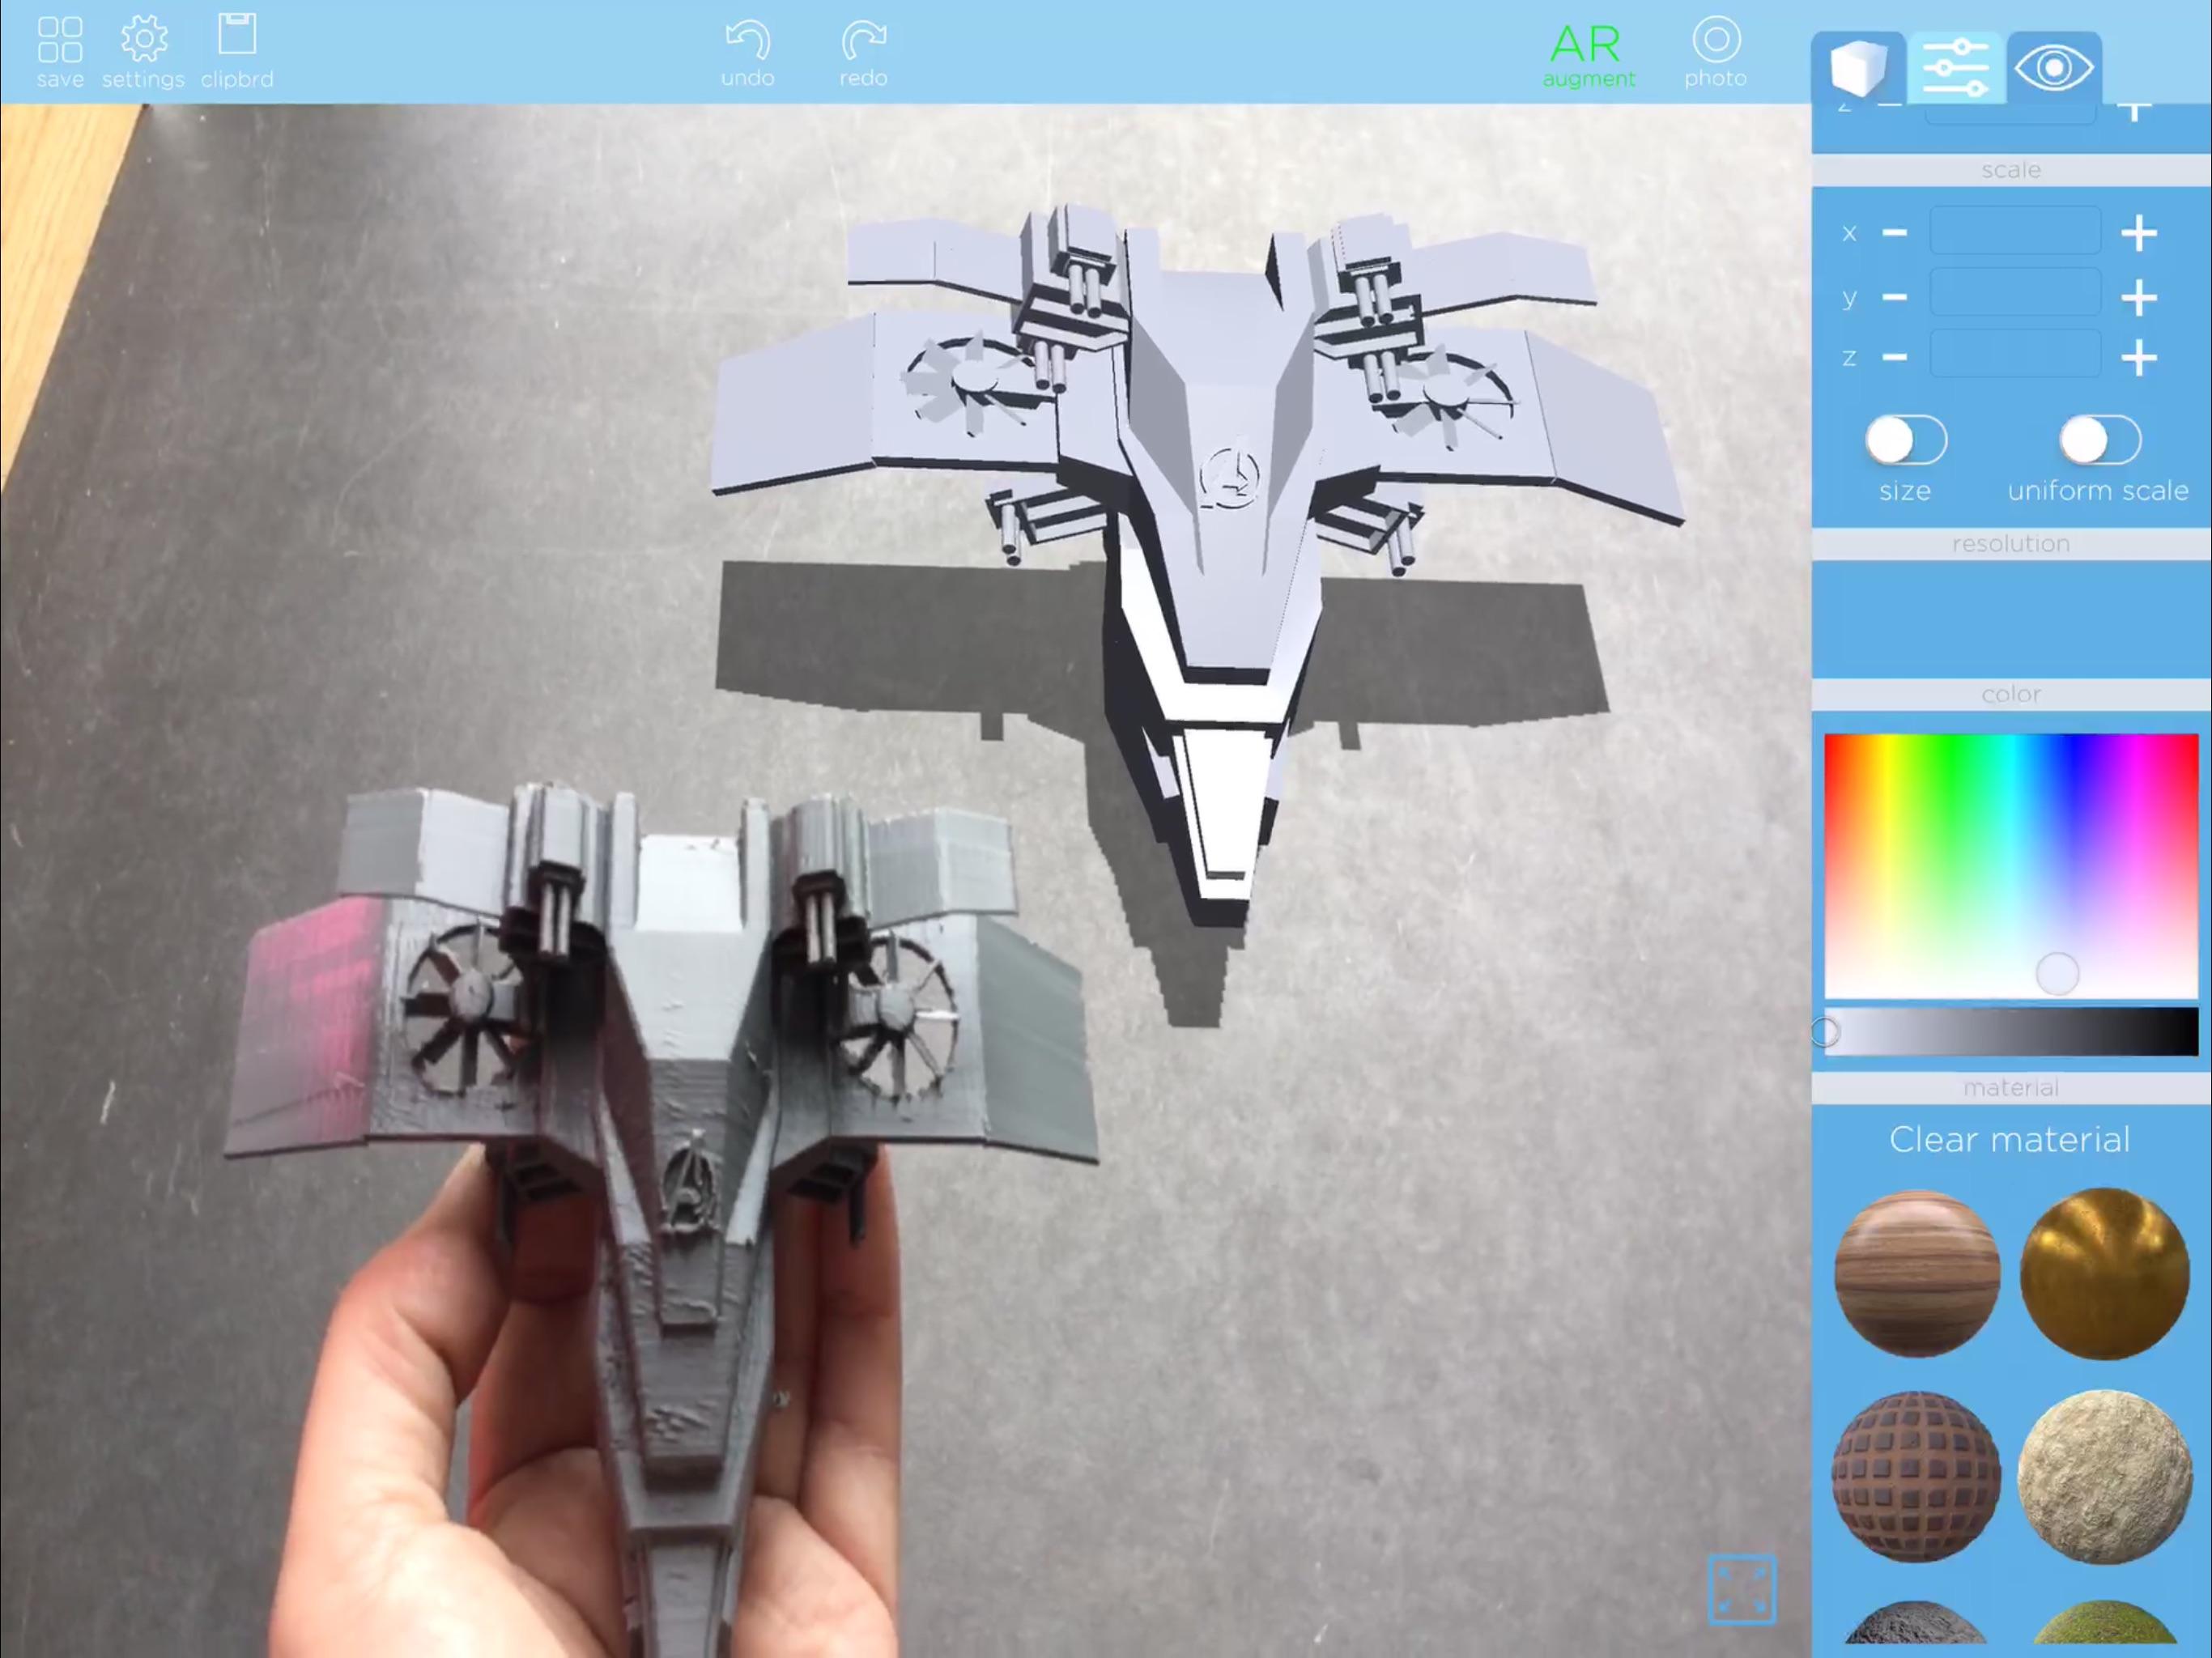 MorphiEdu: 3D Model, Print, AR Screenshot